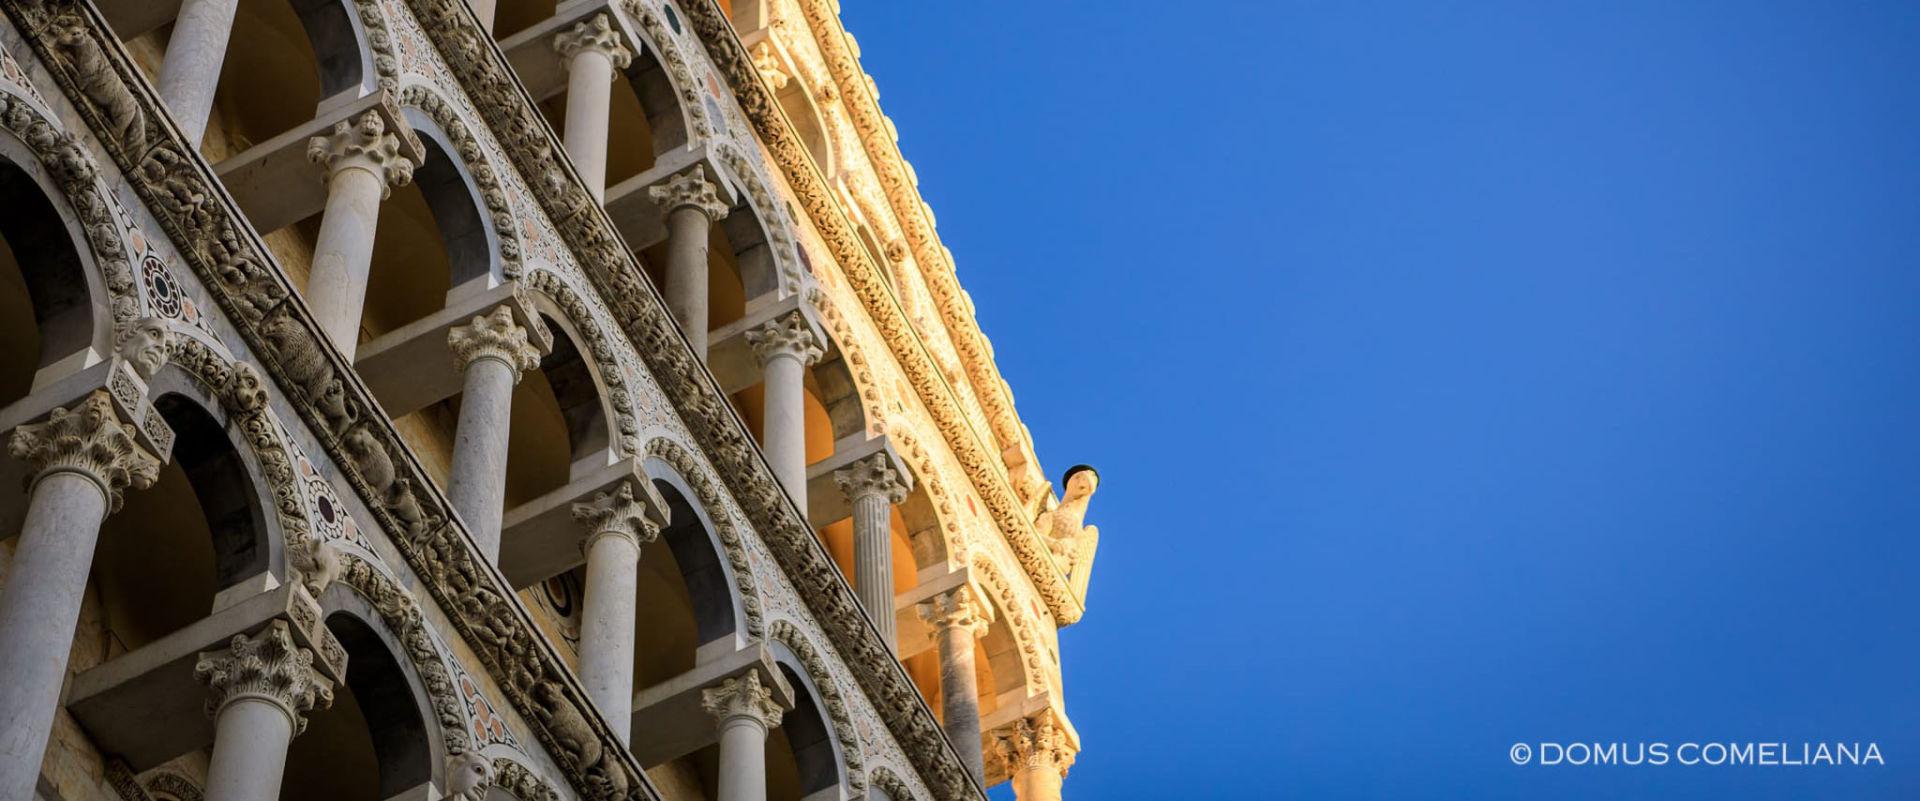 Duomo di Pisa - Dettaglio facciata